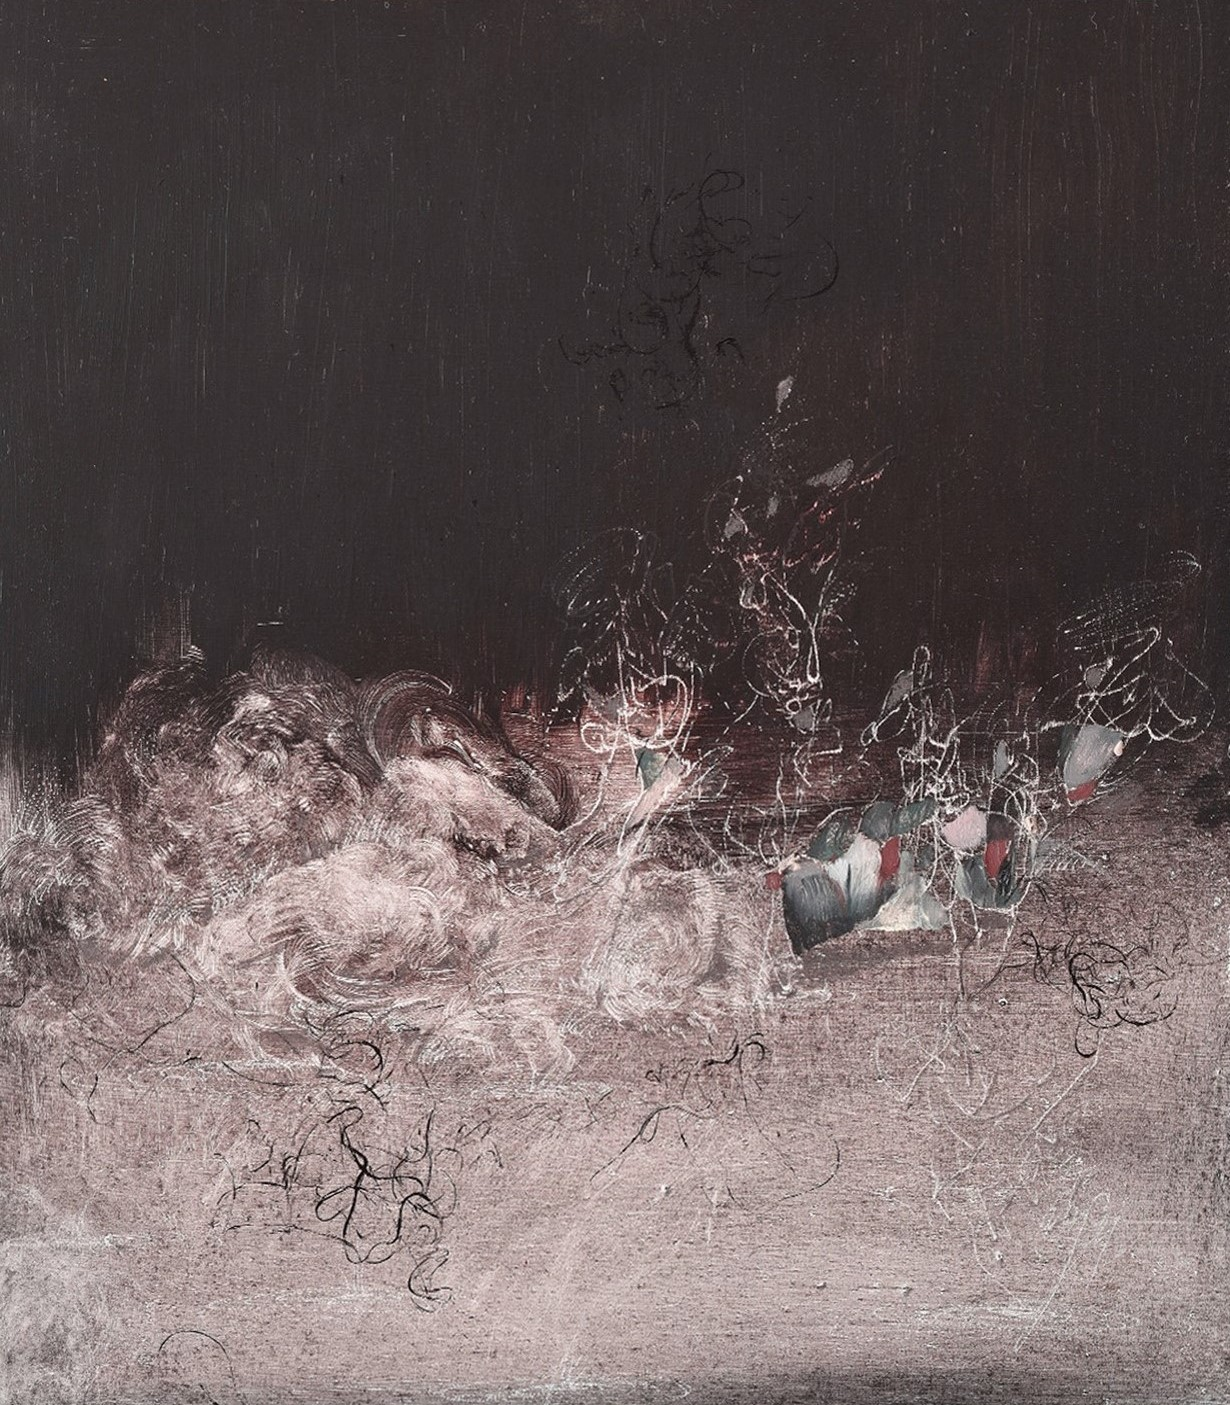 Massimo Angei, Il mese nero, 2020, olio su MDF, 30x26 cm